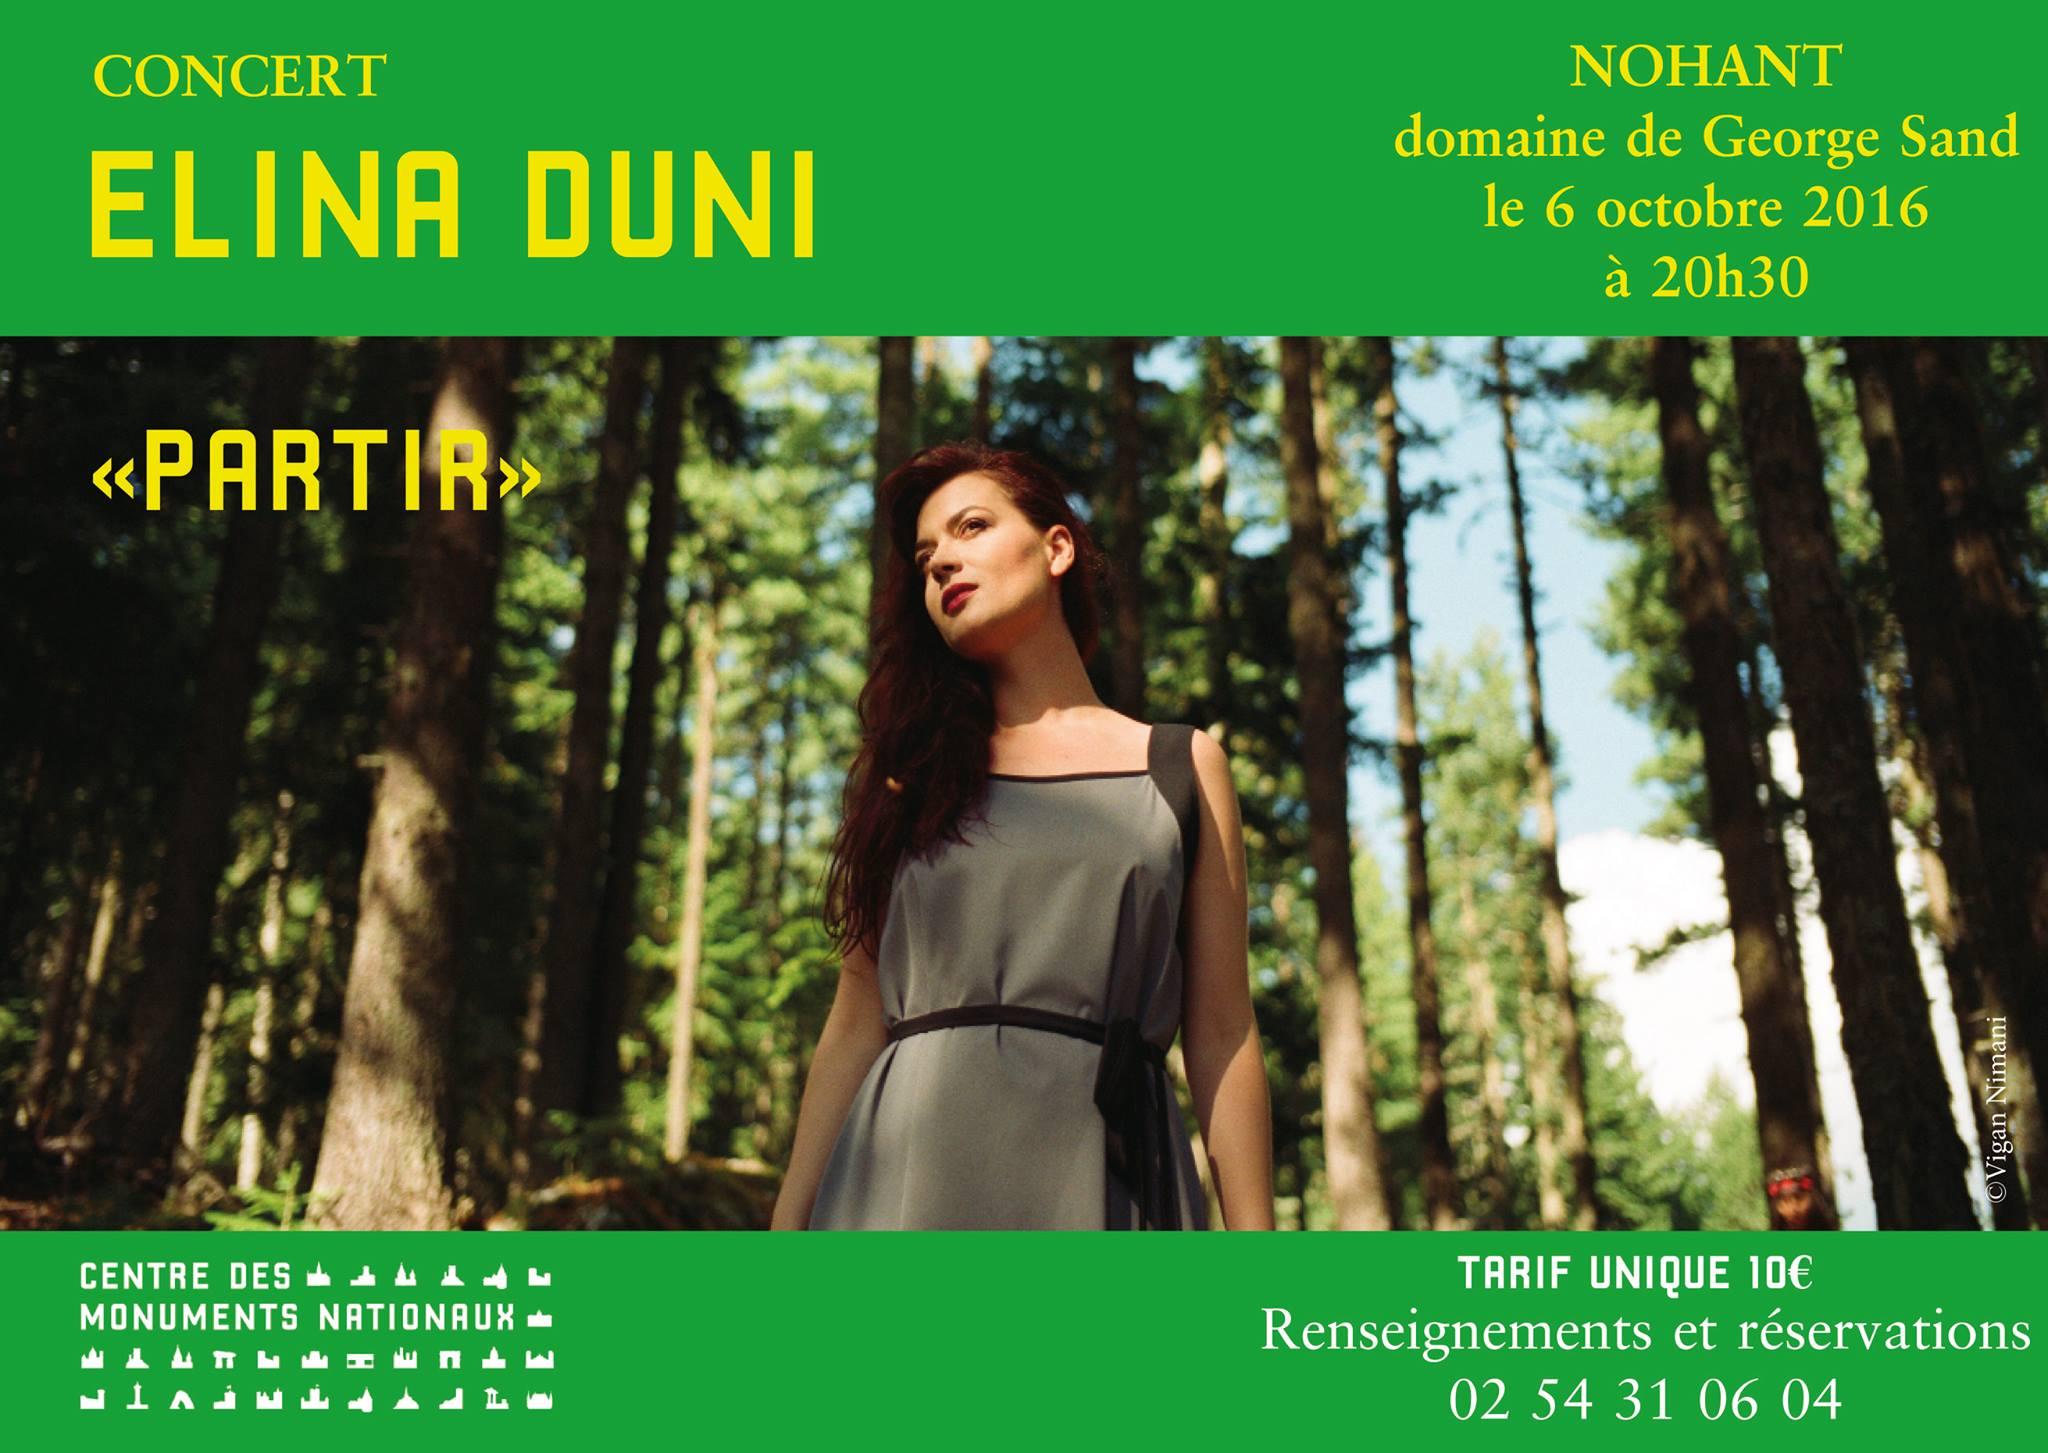 concert-elina-duni-nohant